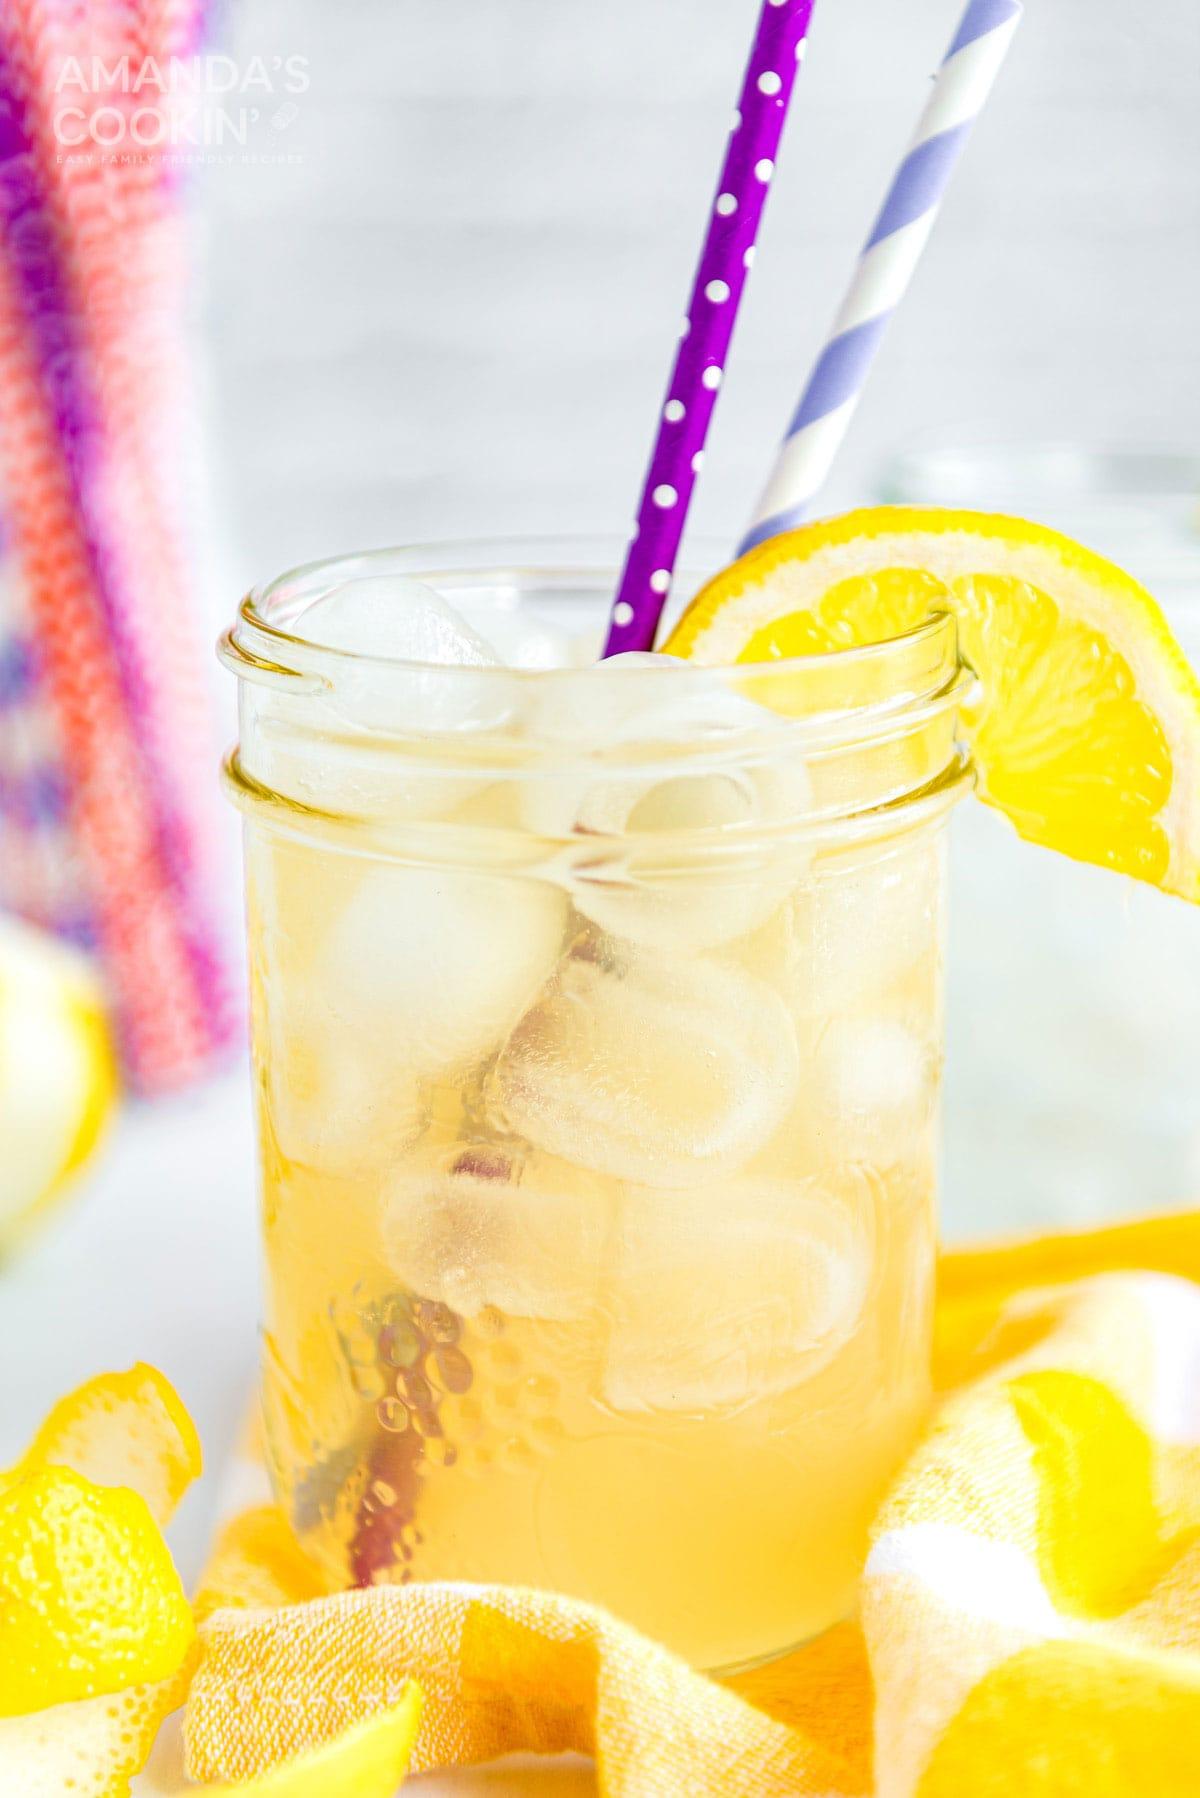 mason jar glass of lynchburg lemonade with straws and a lemon garnish